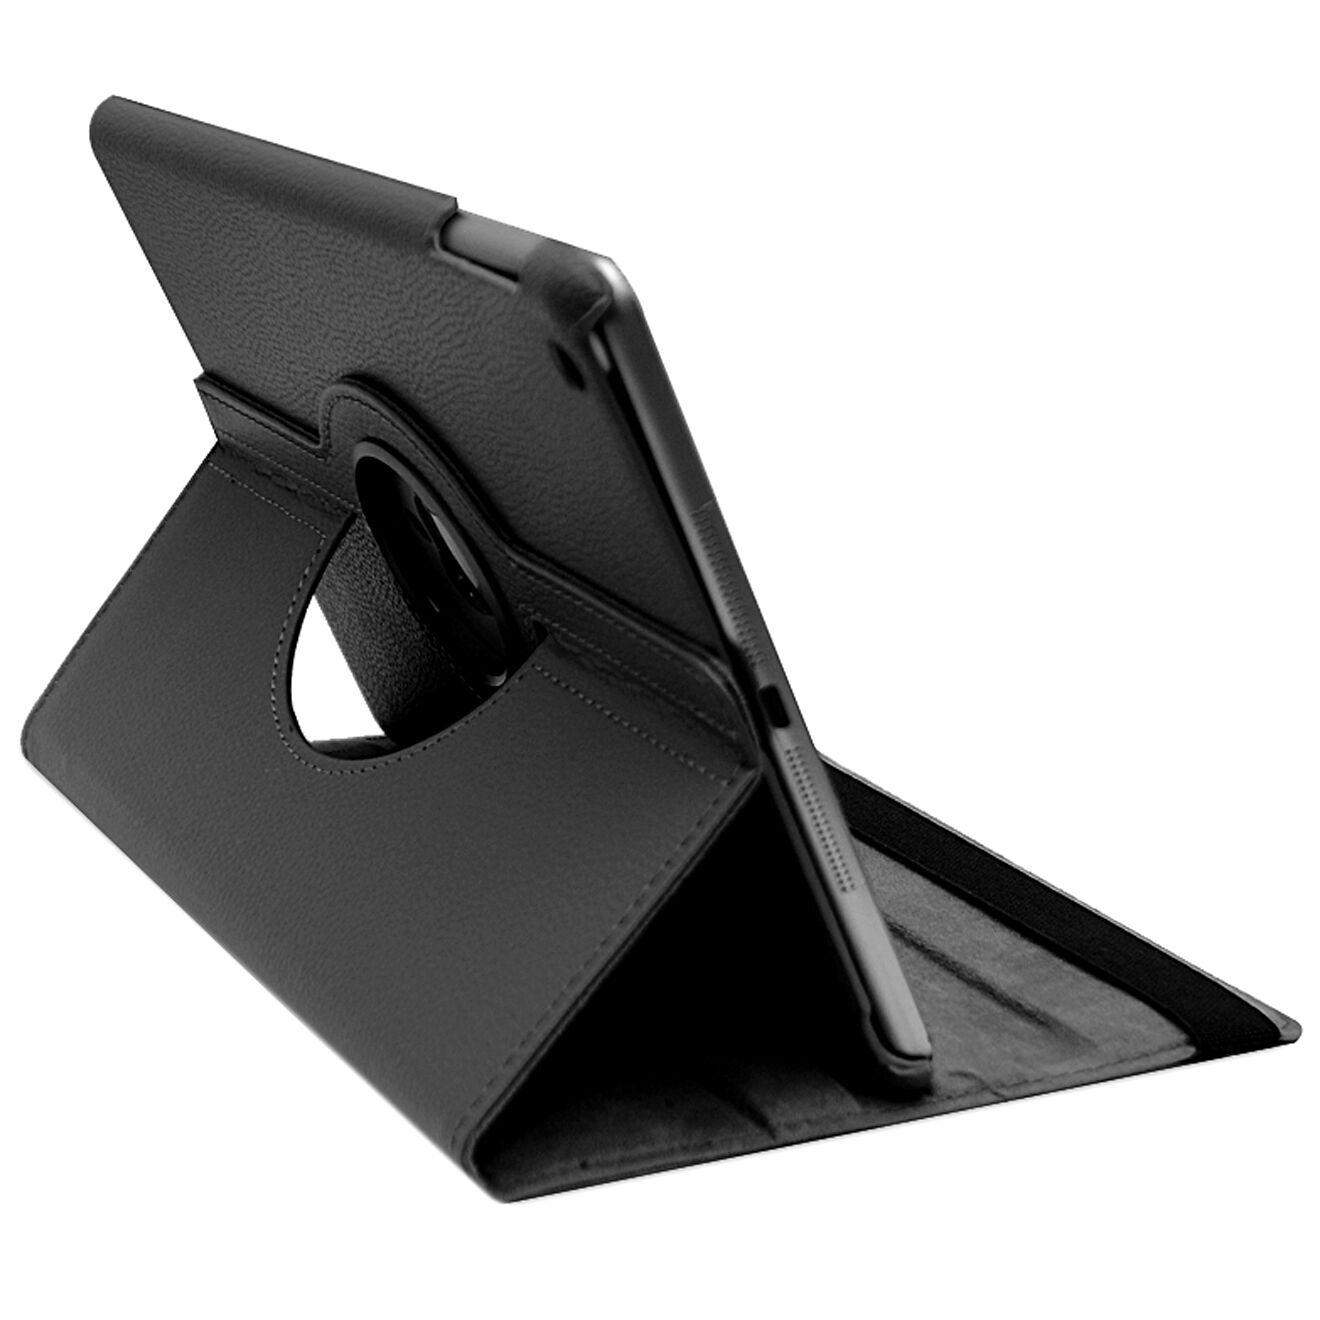 Inki Housse iPad Air - noire